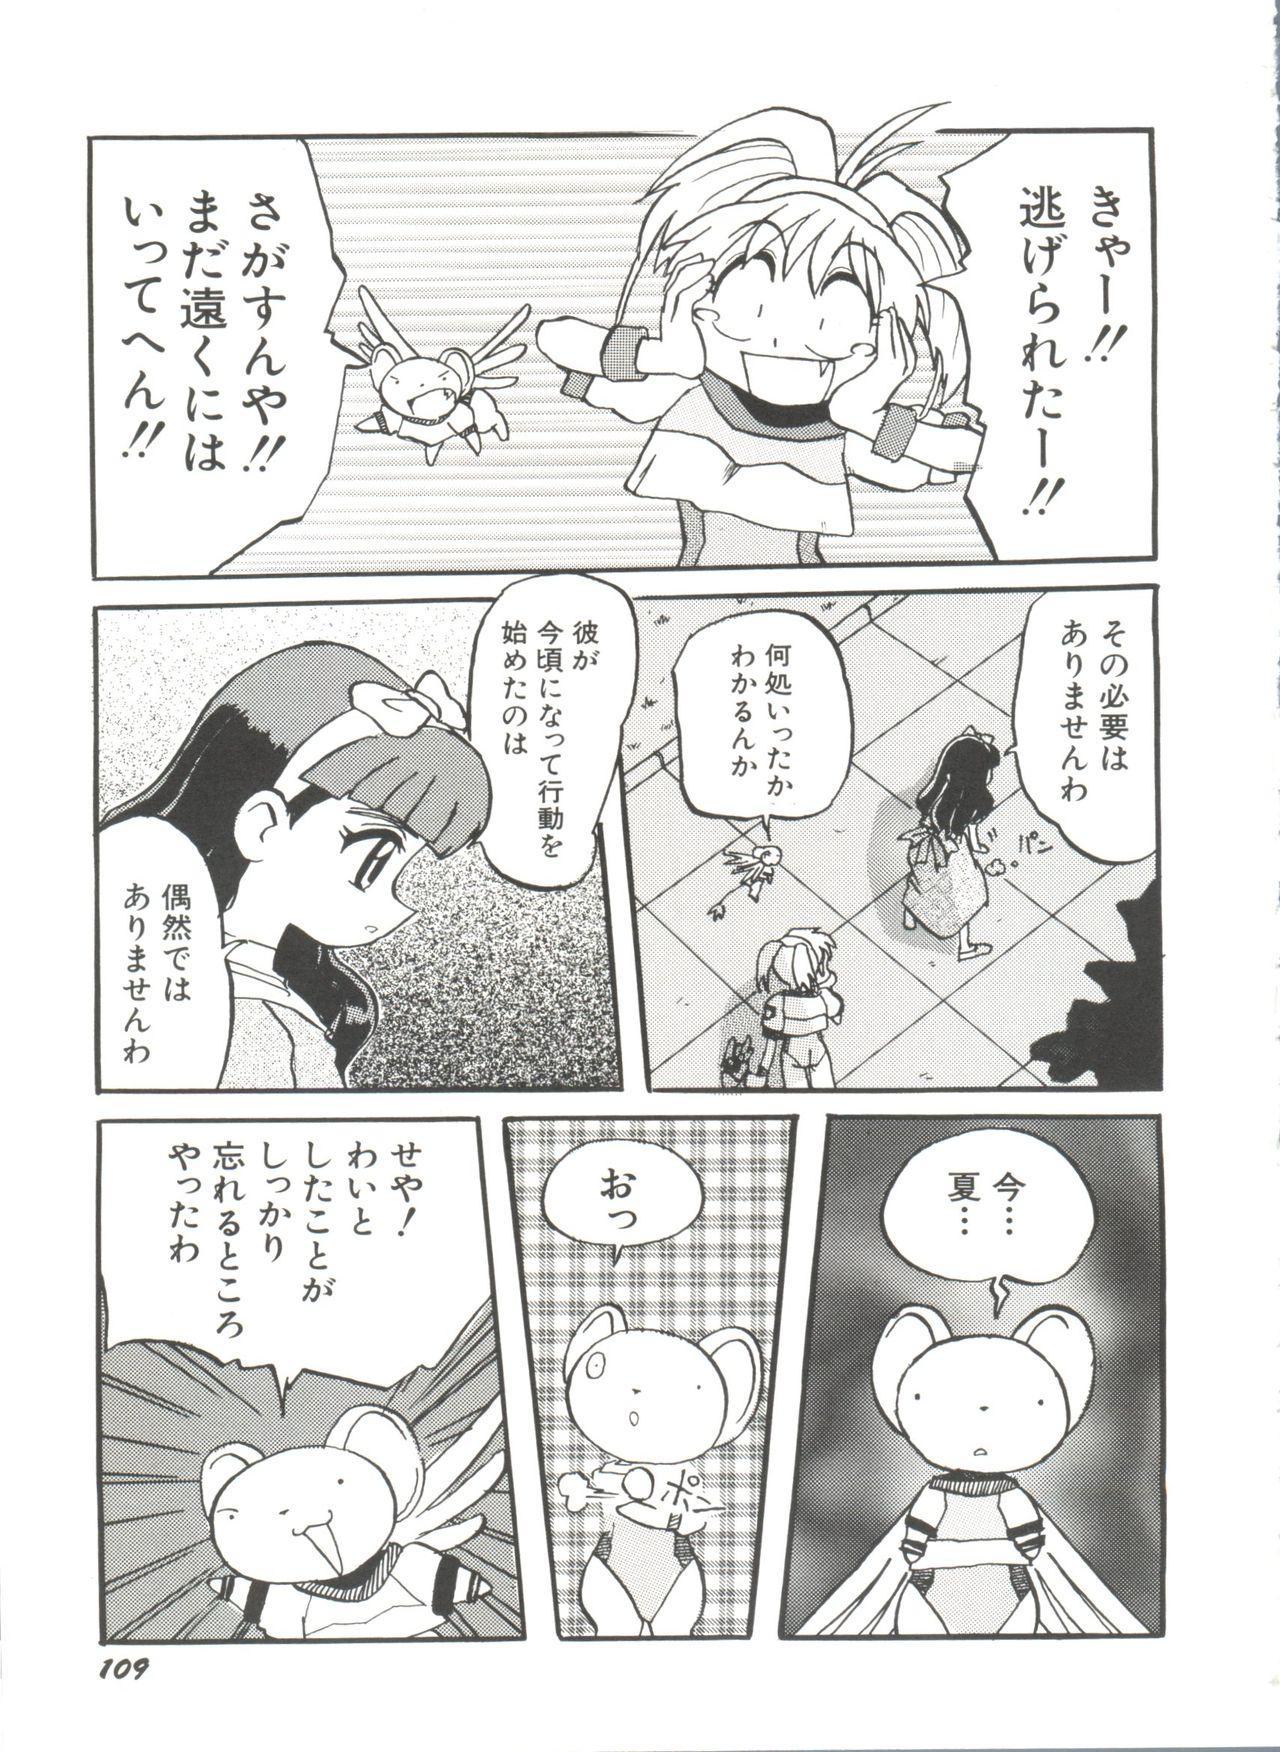 [Anthology] Denei Tamatebako 8 - Utakata no Tenshi-tachi II (Various) 110